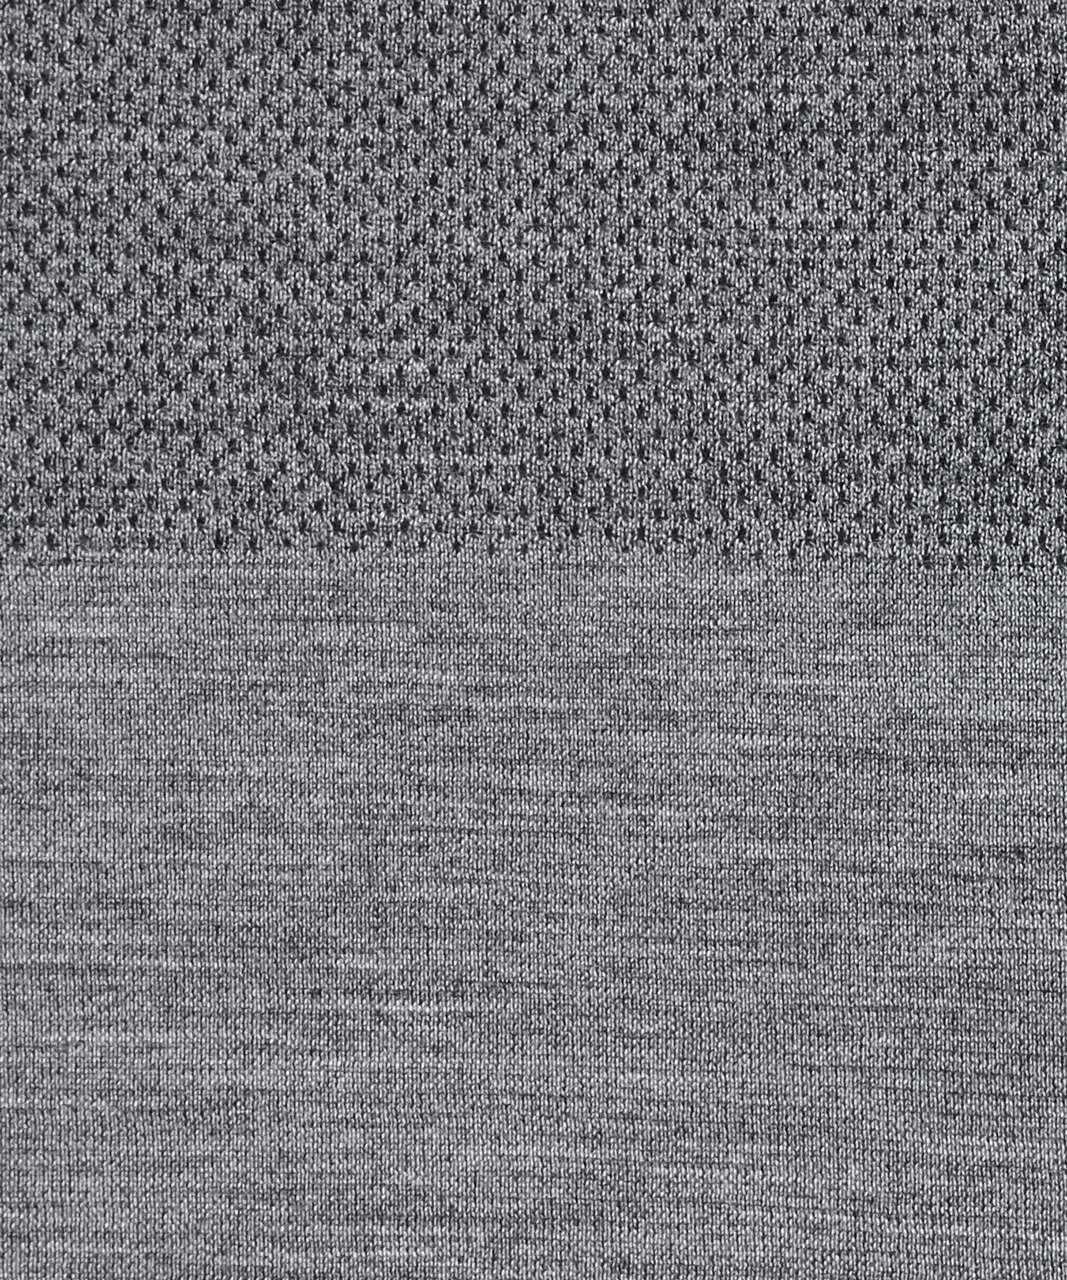 Lululemon Aerial Silk Long Sleeve - Black / White